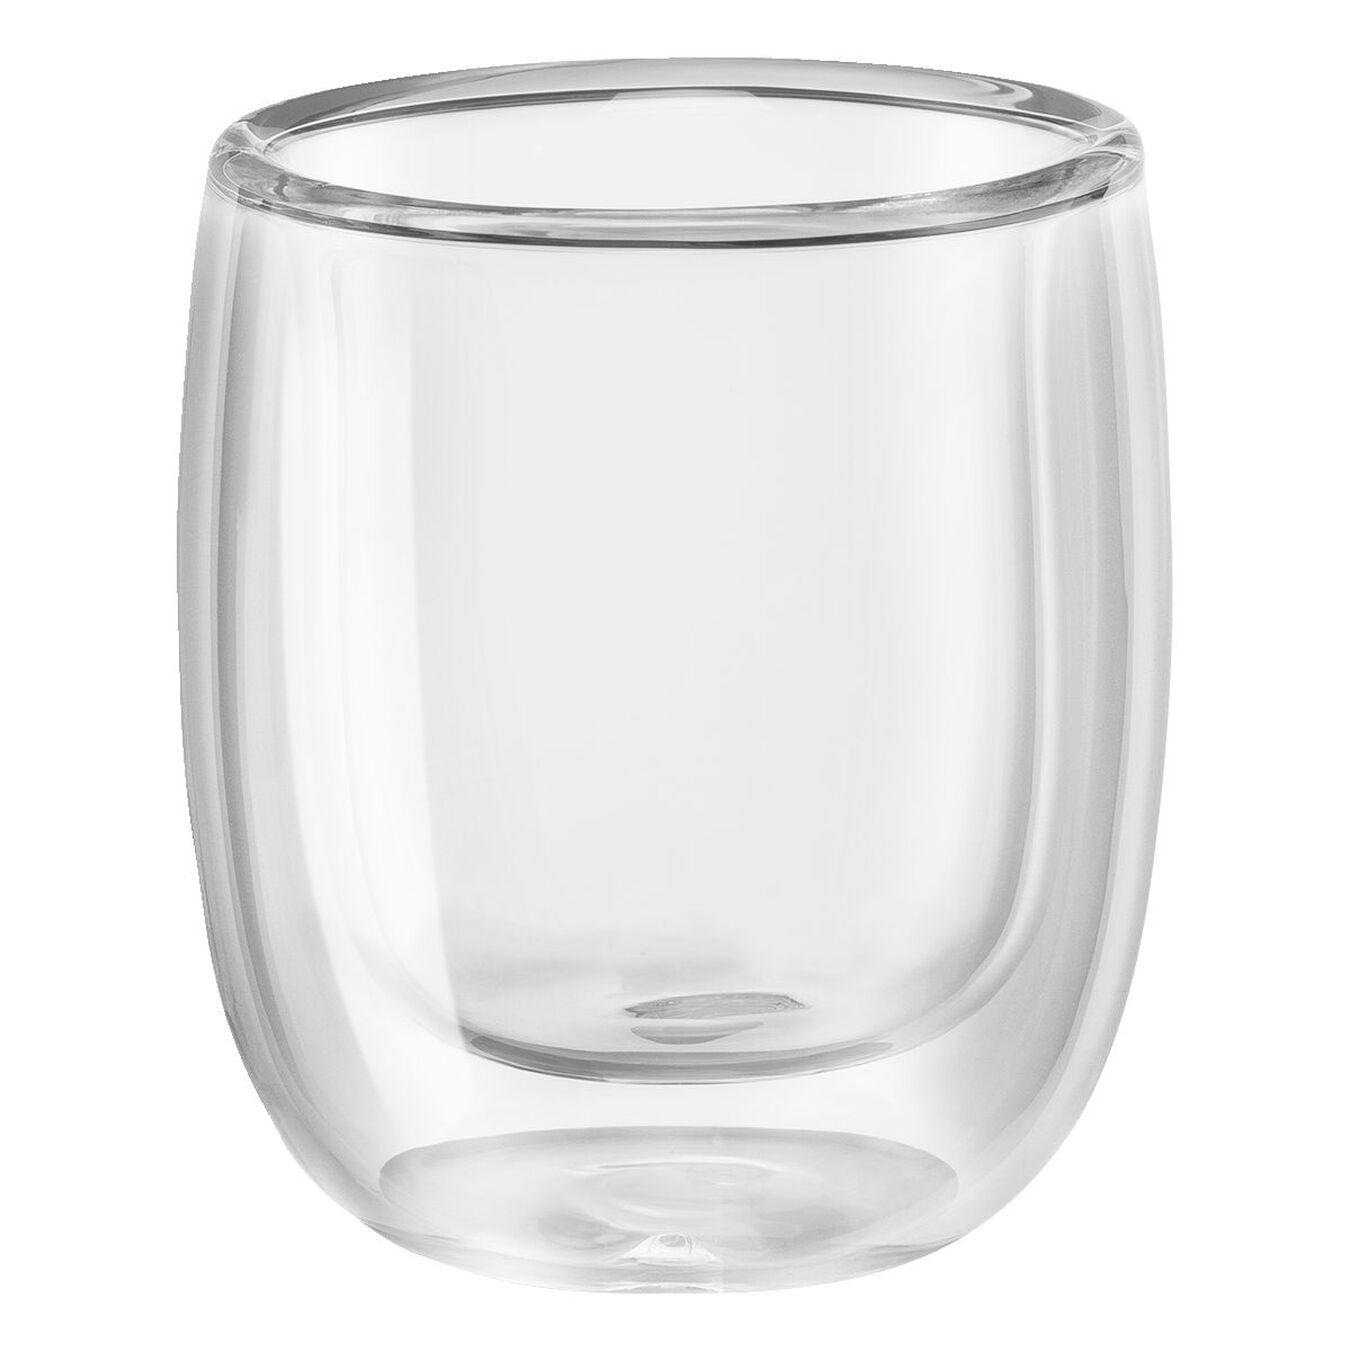 Espresso Bardağı Seti | Cam | 2-adet,,large 4